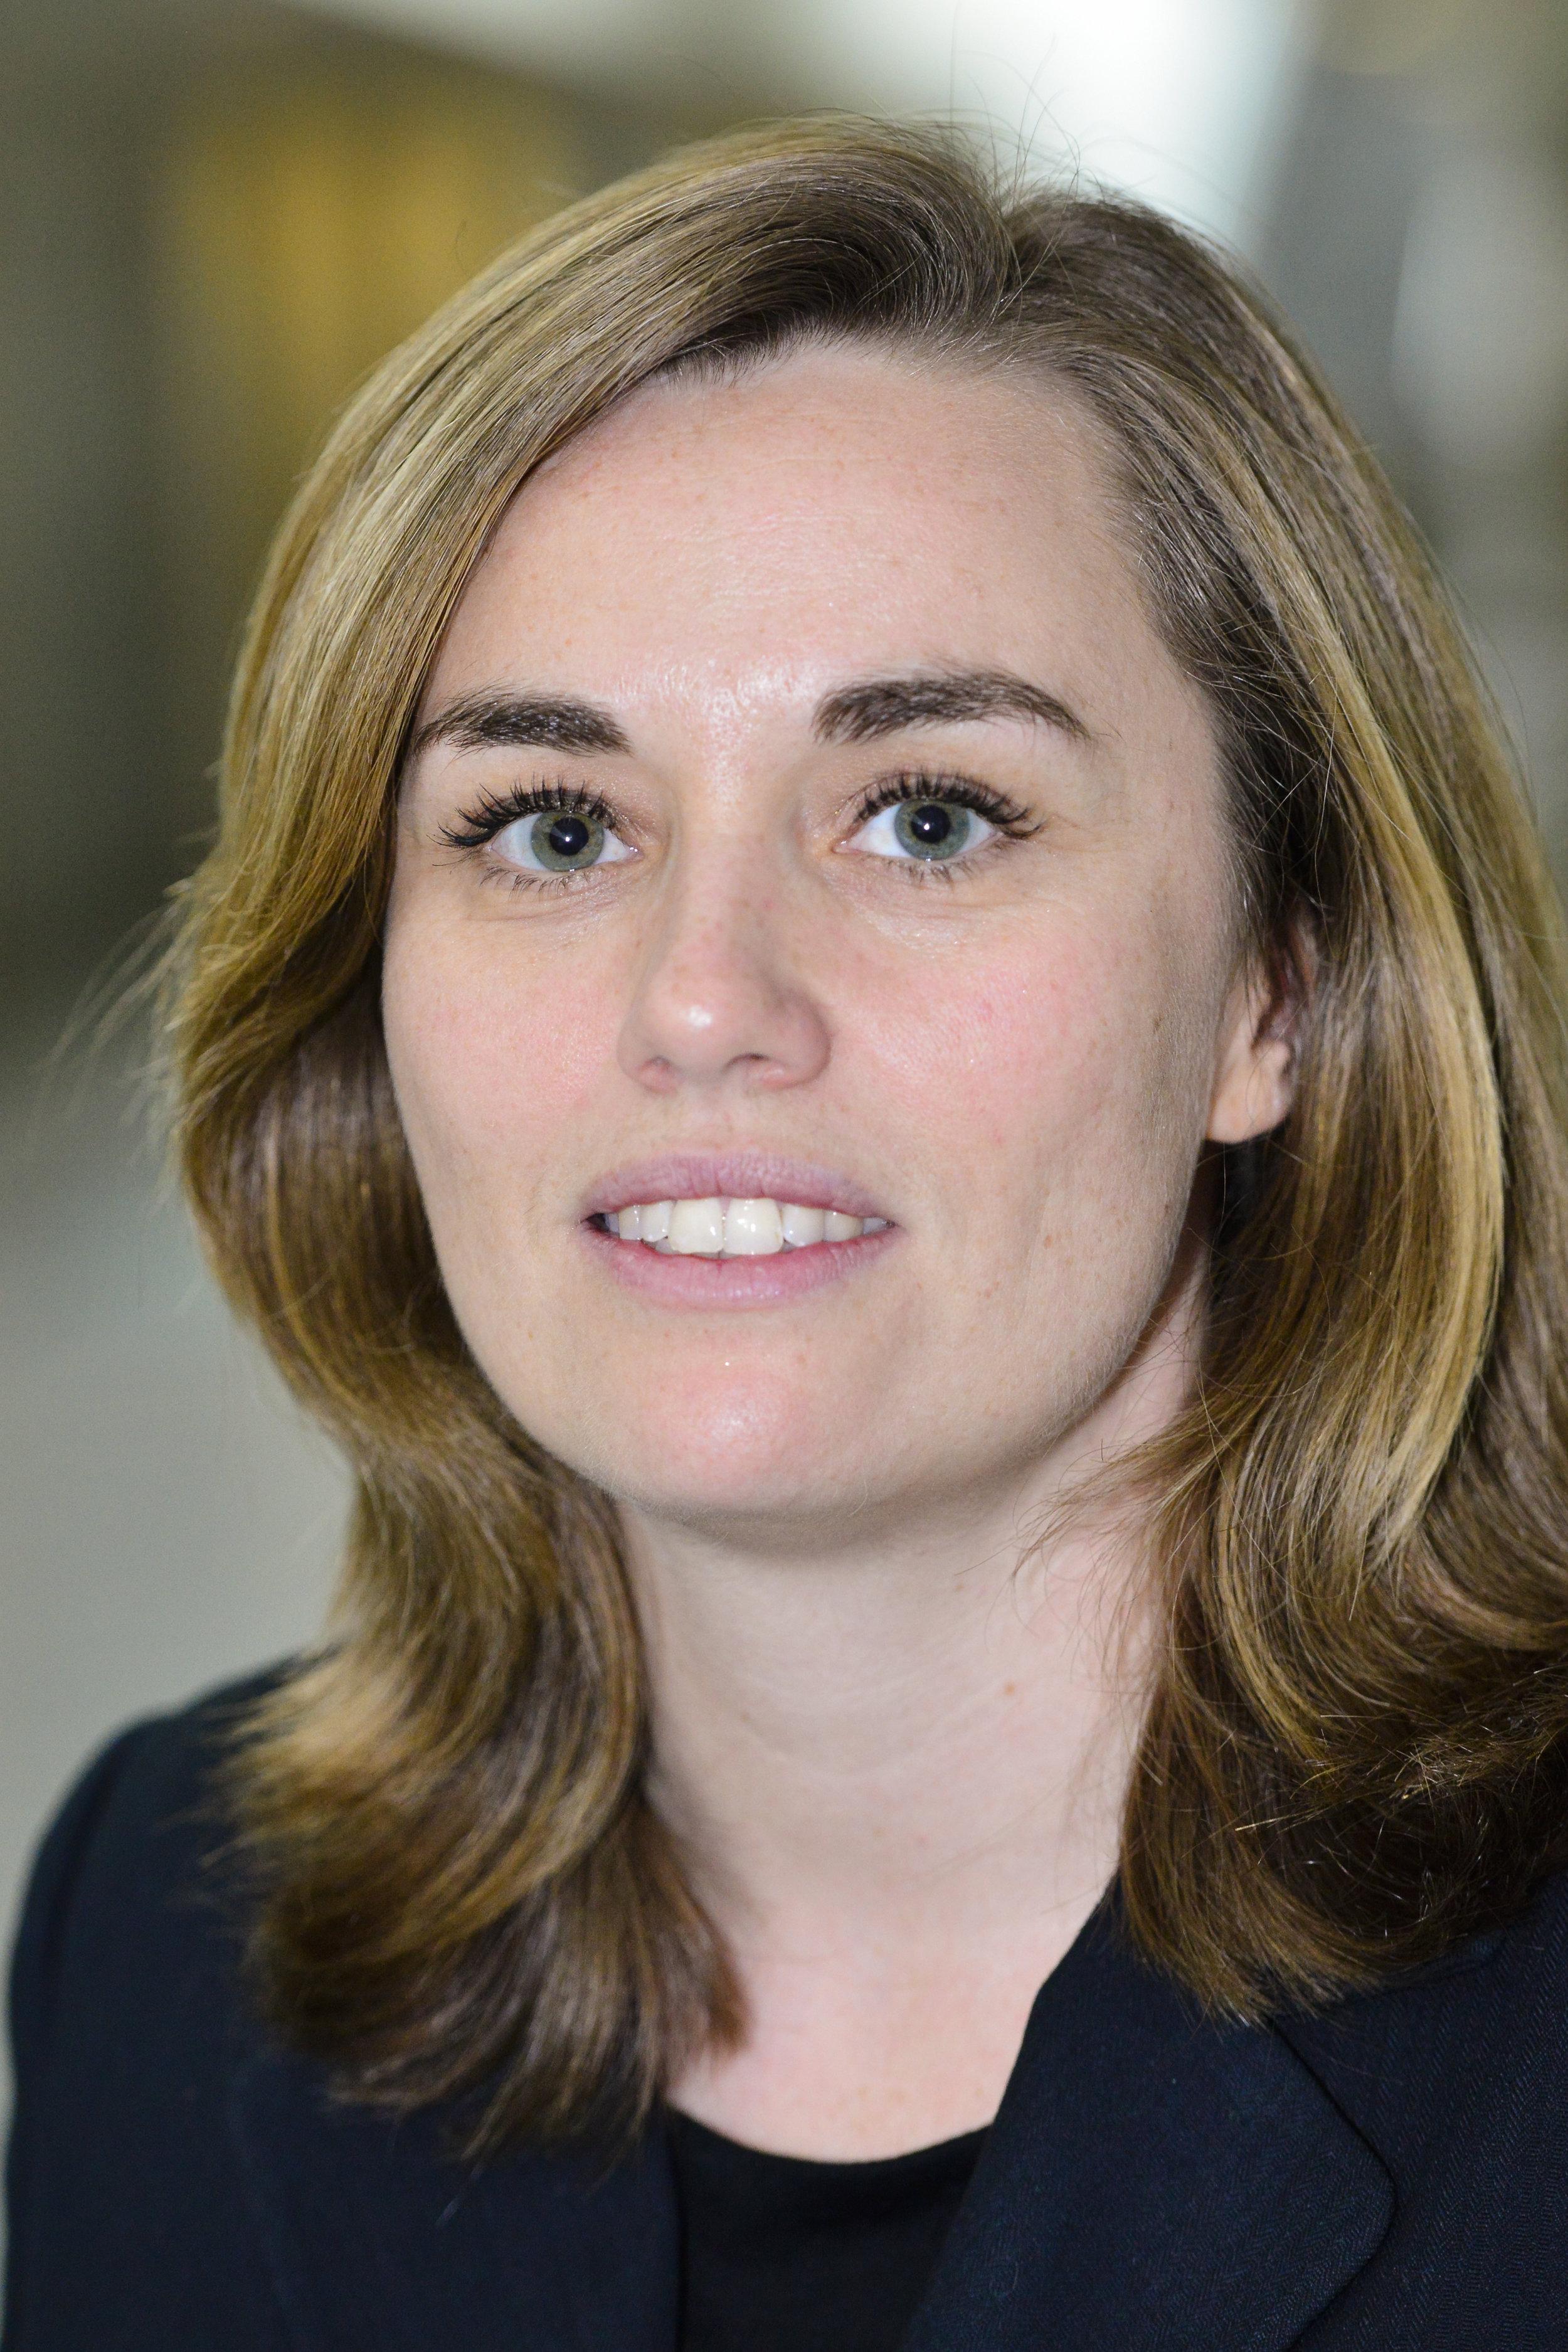 Lina Ehrig, Verbraucherzentrale Bundesverband